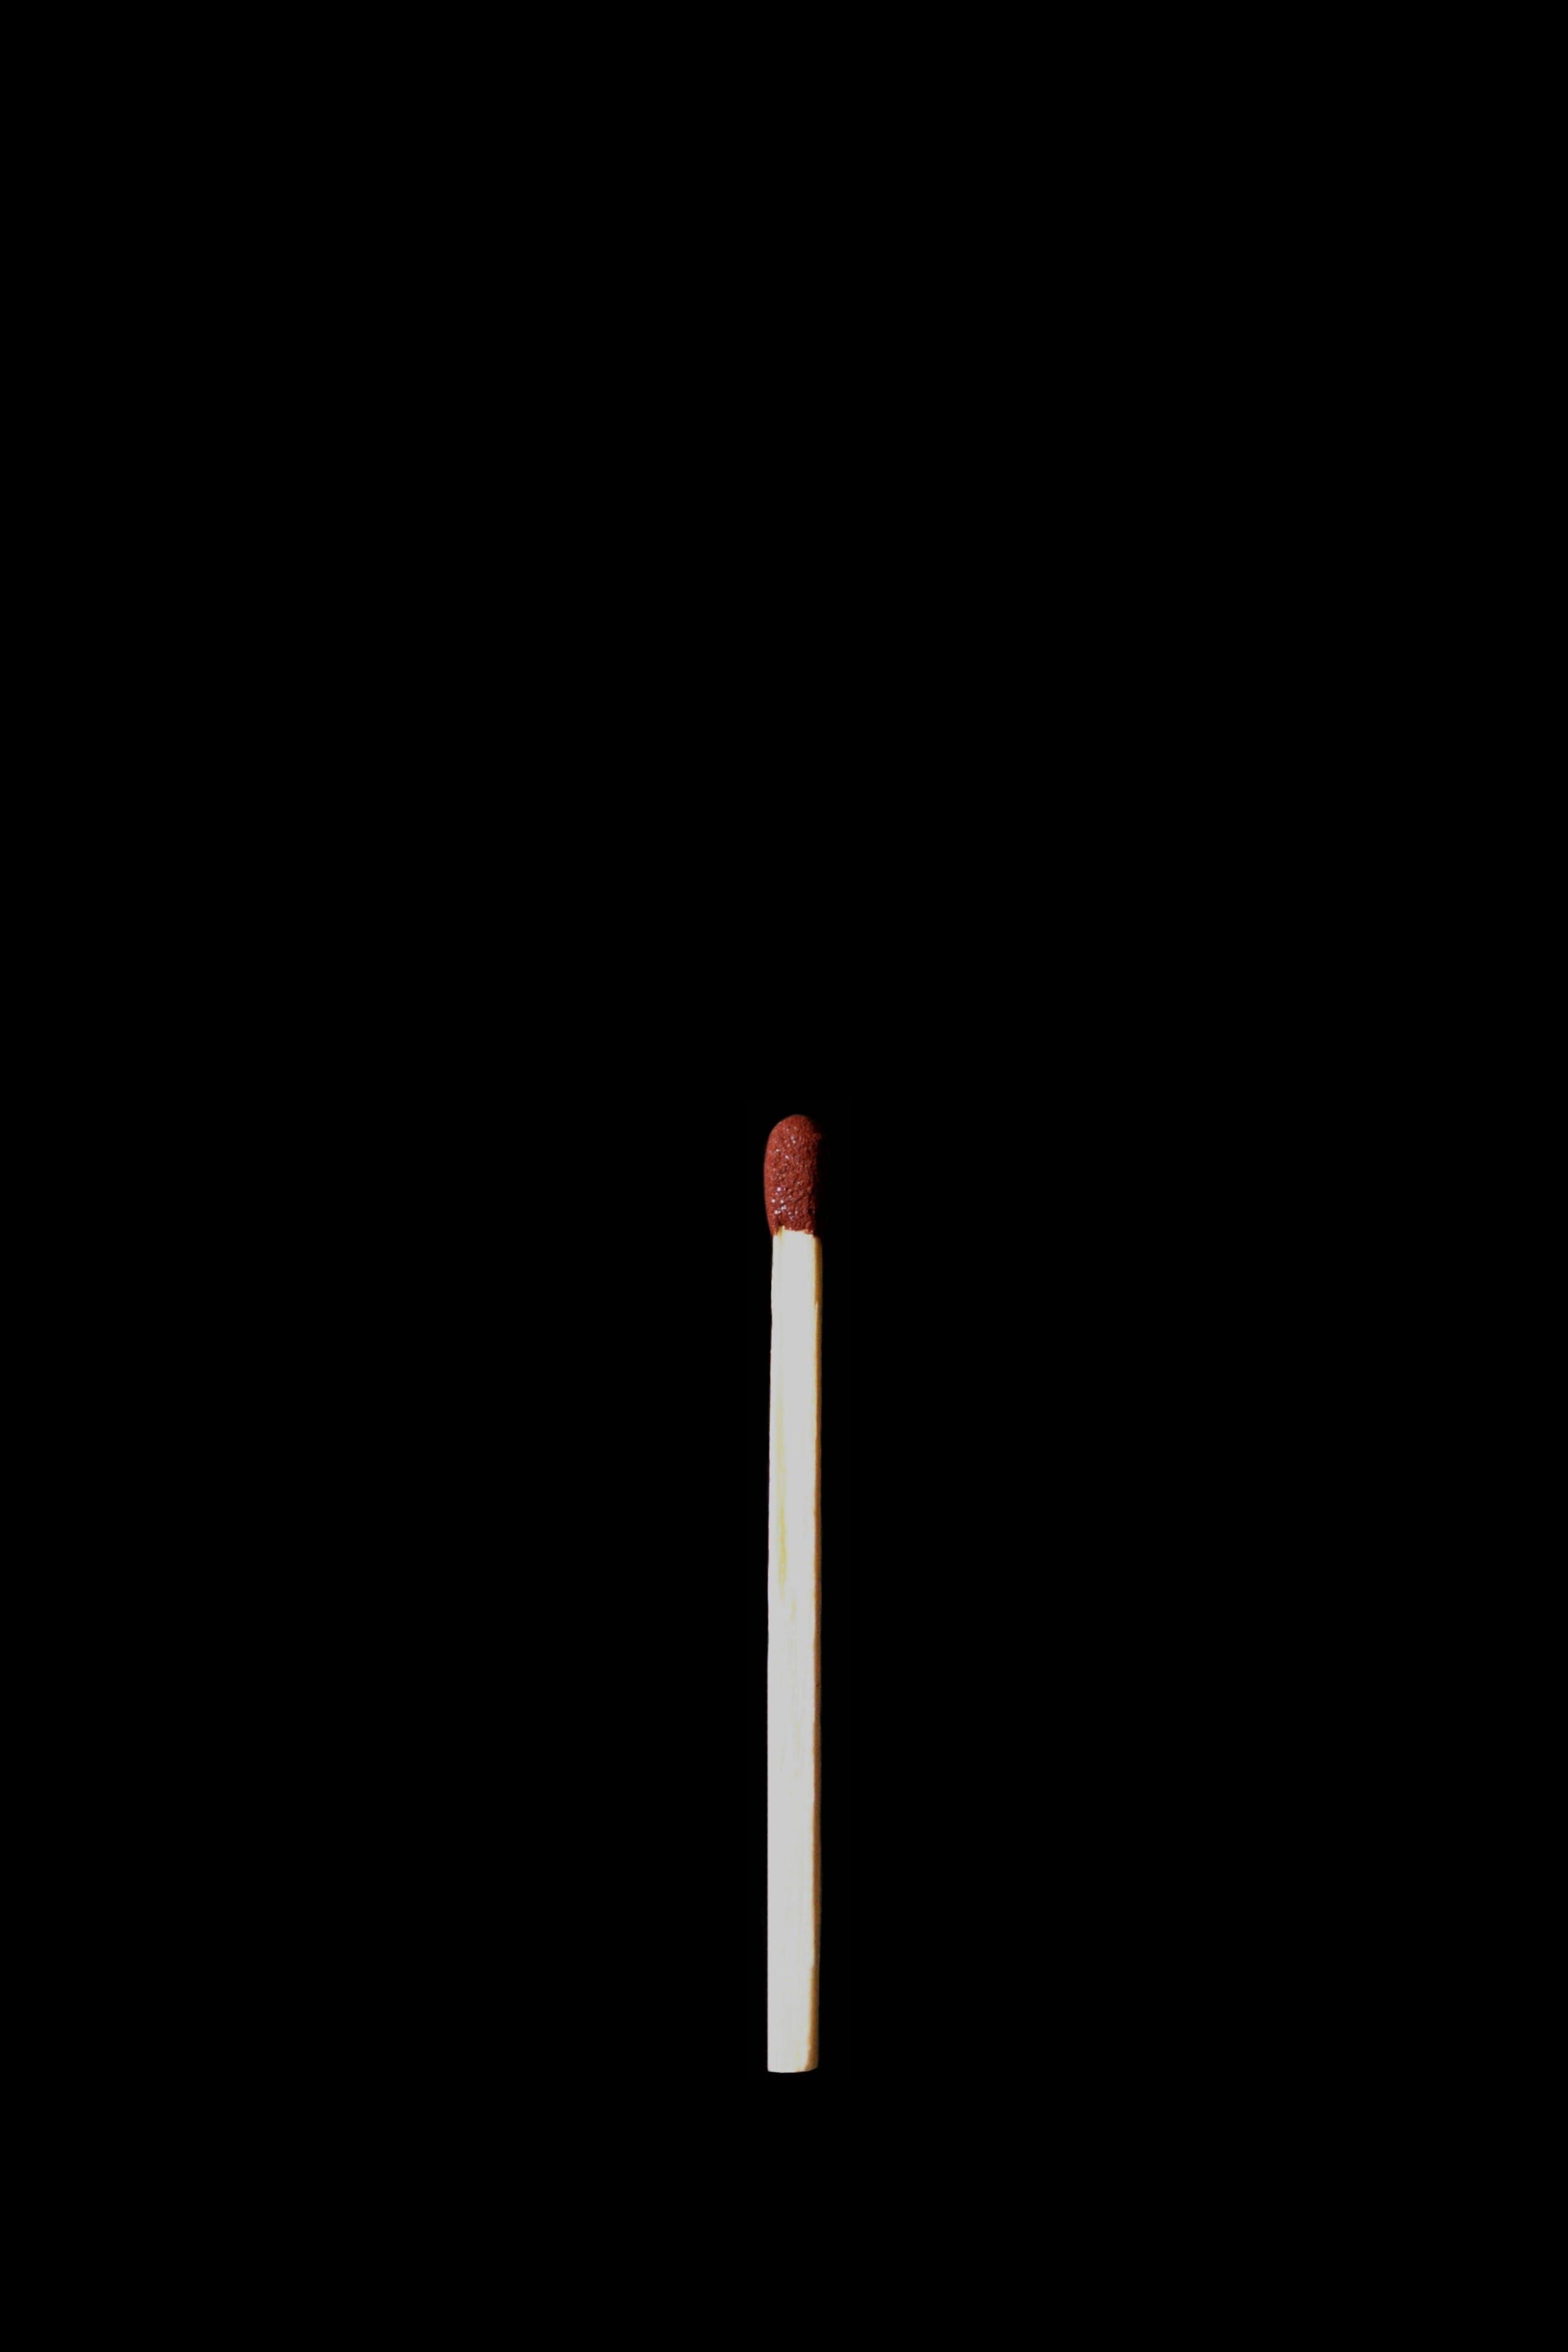 White Matchstick